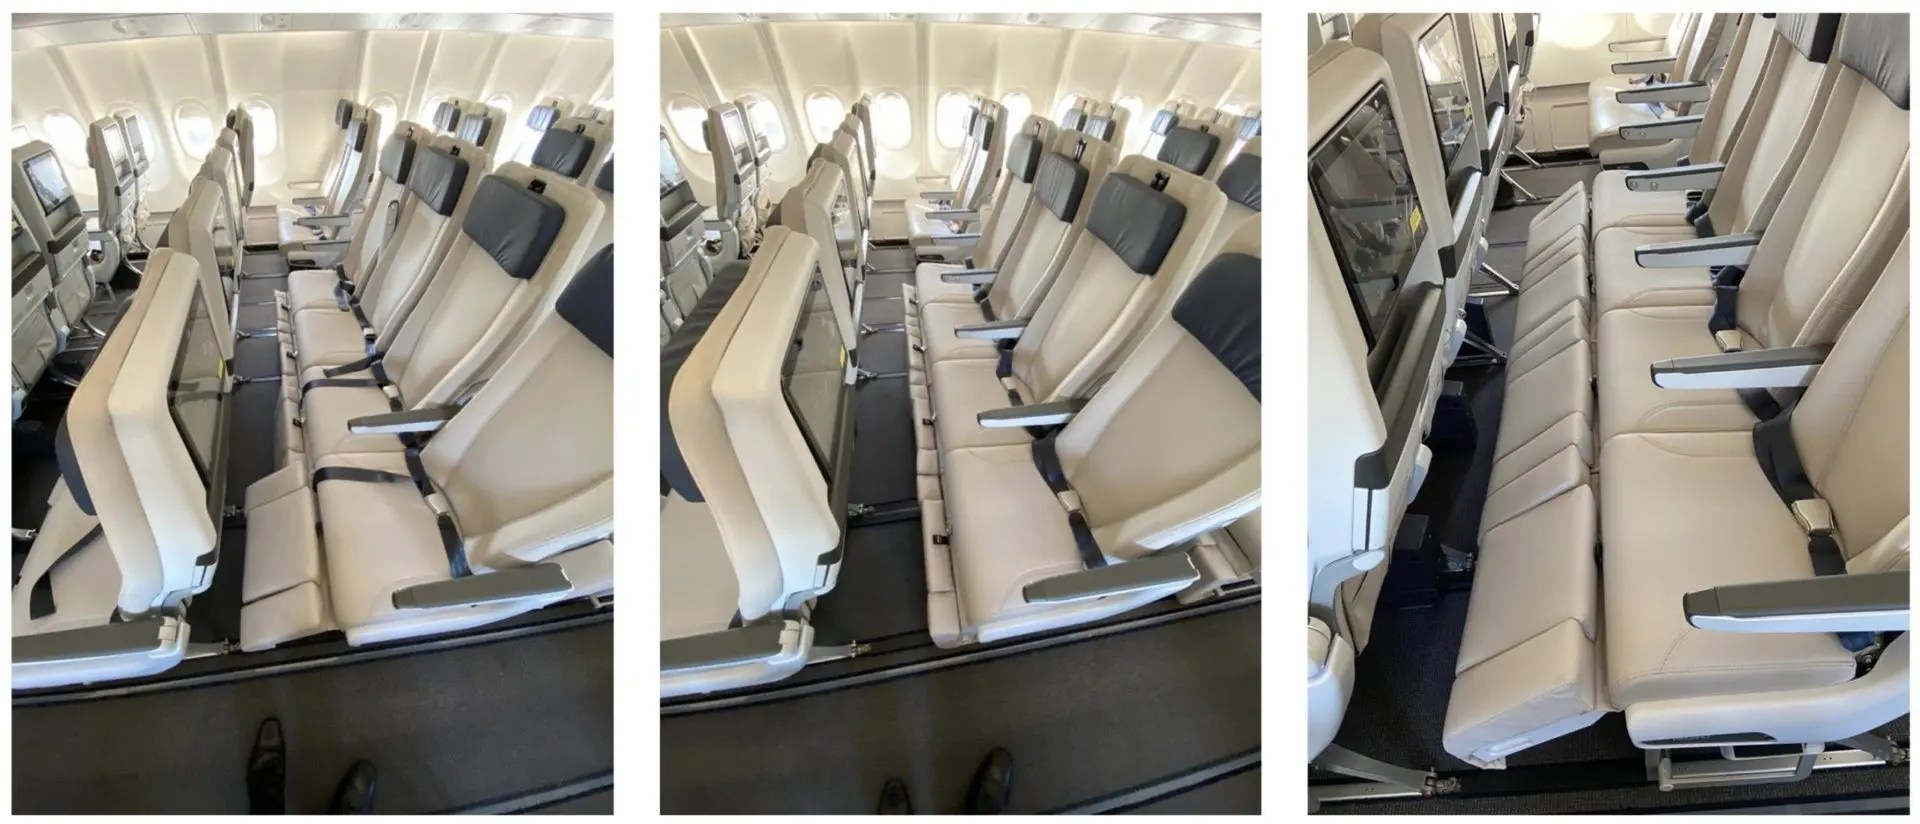 Azul SkySofa A330-900neo